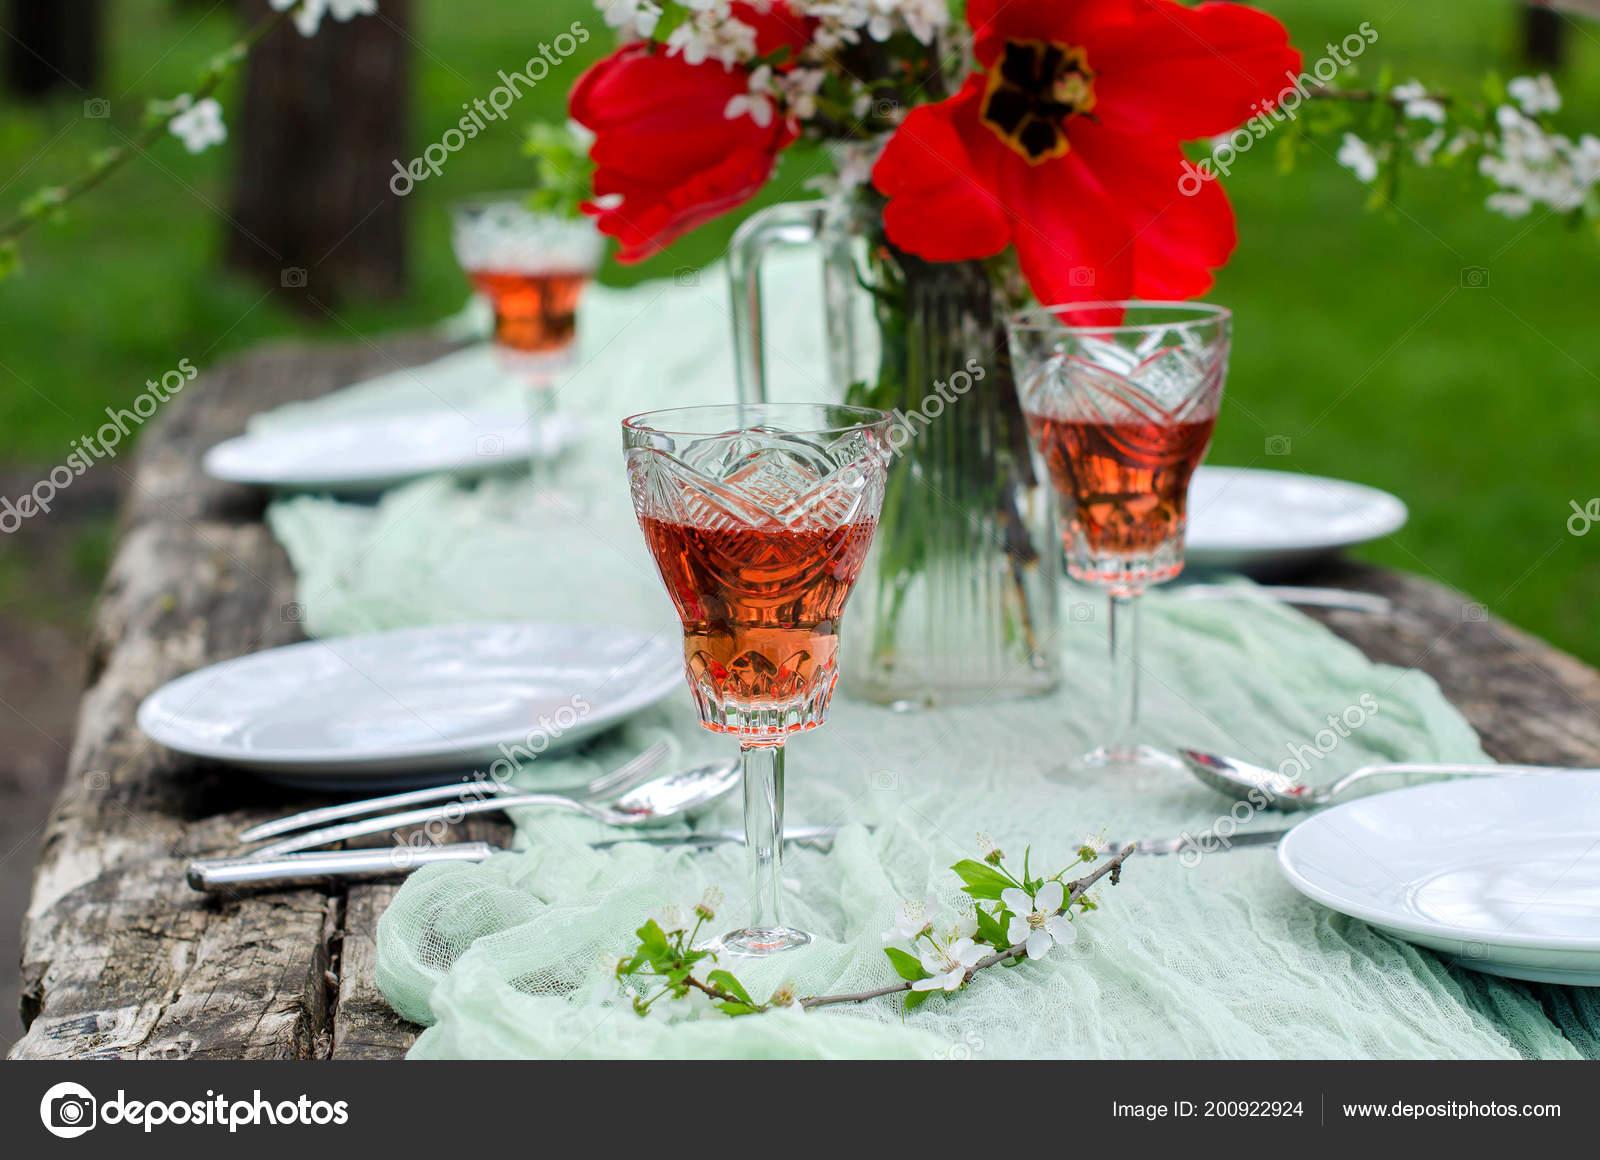 Belle Table Fond Fête Dans Jardin Ancienne Table Bois Cerisiers ...